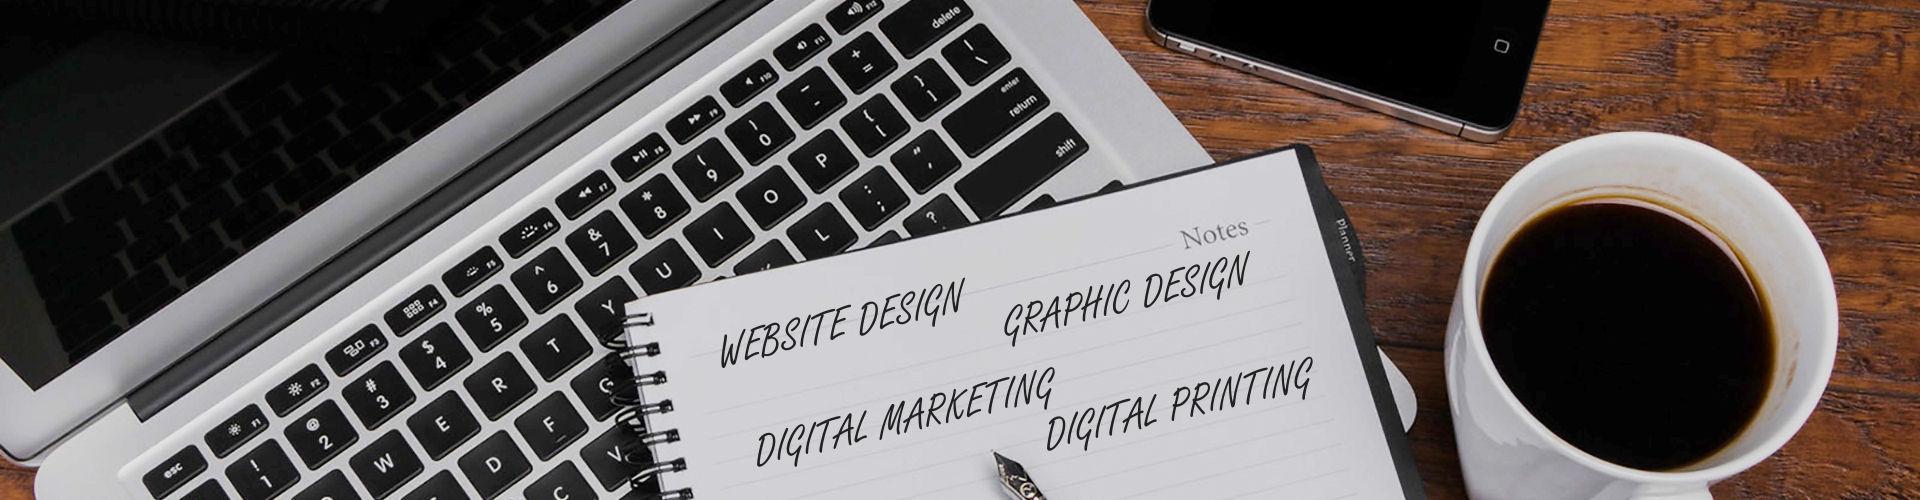 Website Designers - Graphic Designers - Digital Marketing - Digital Printing